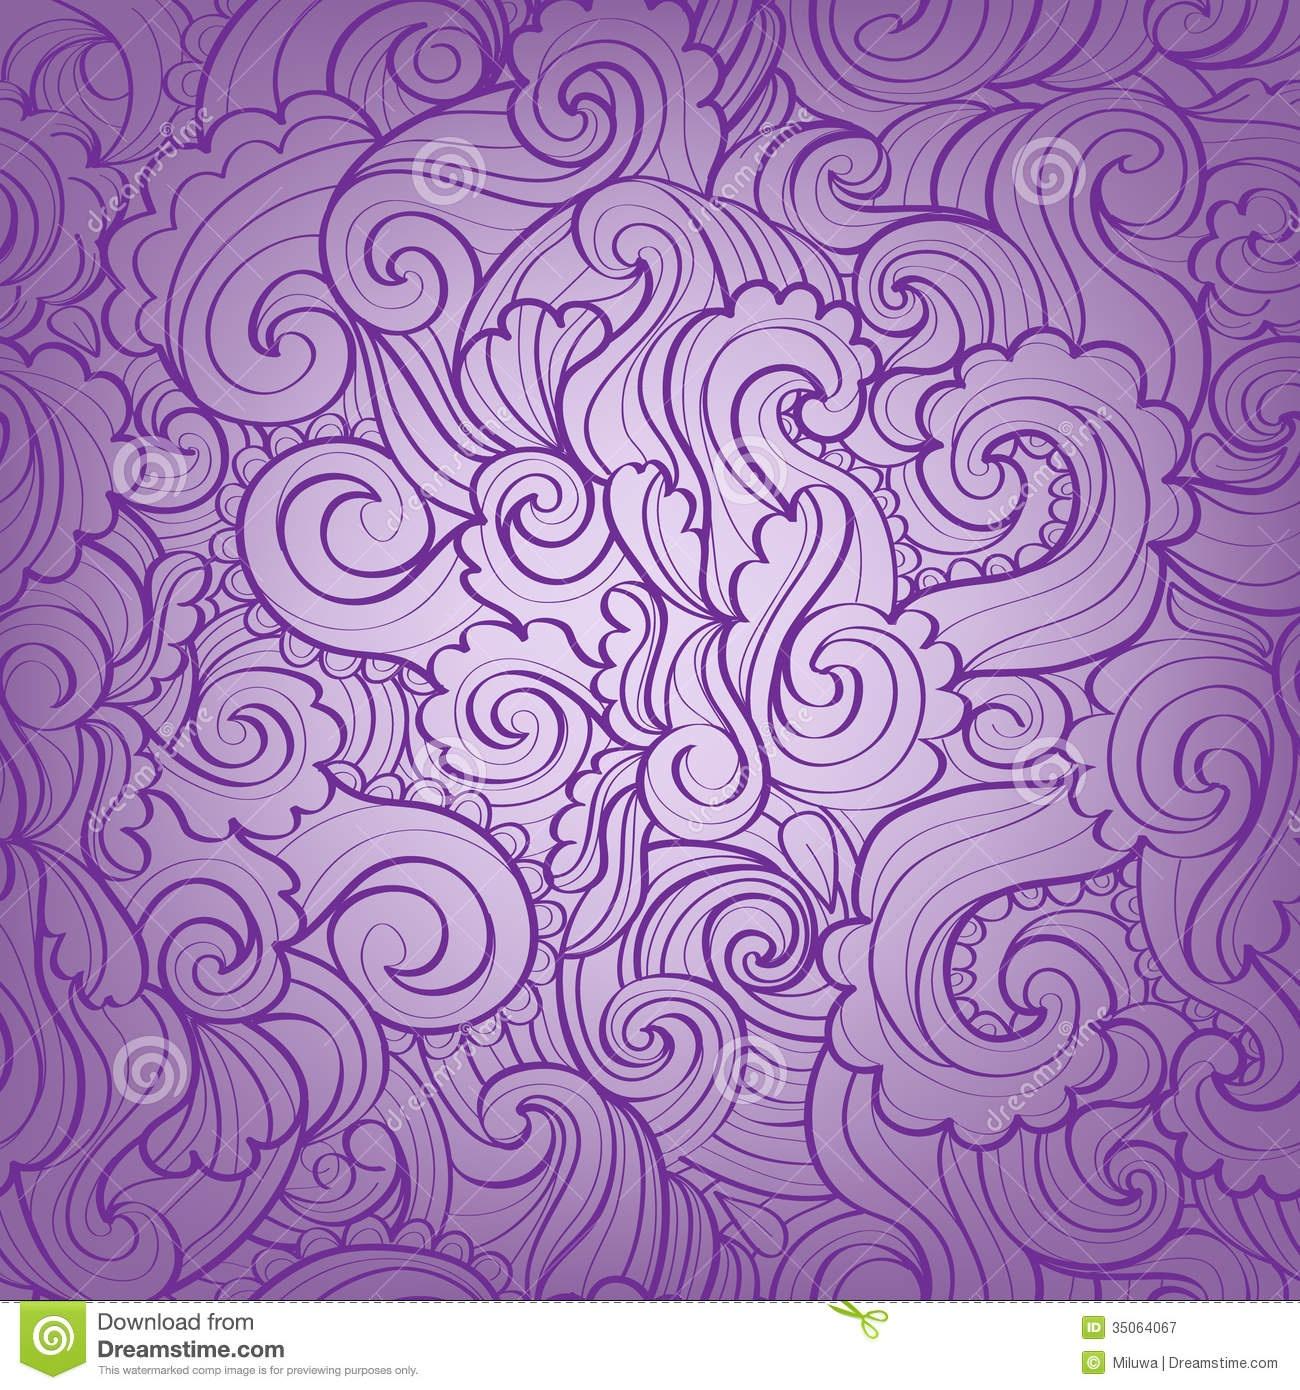 Free Printable Wallpaper Designs - Wallpapersafari - Free Printable Background Designs